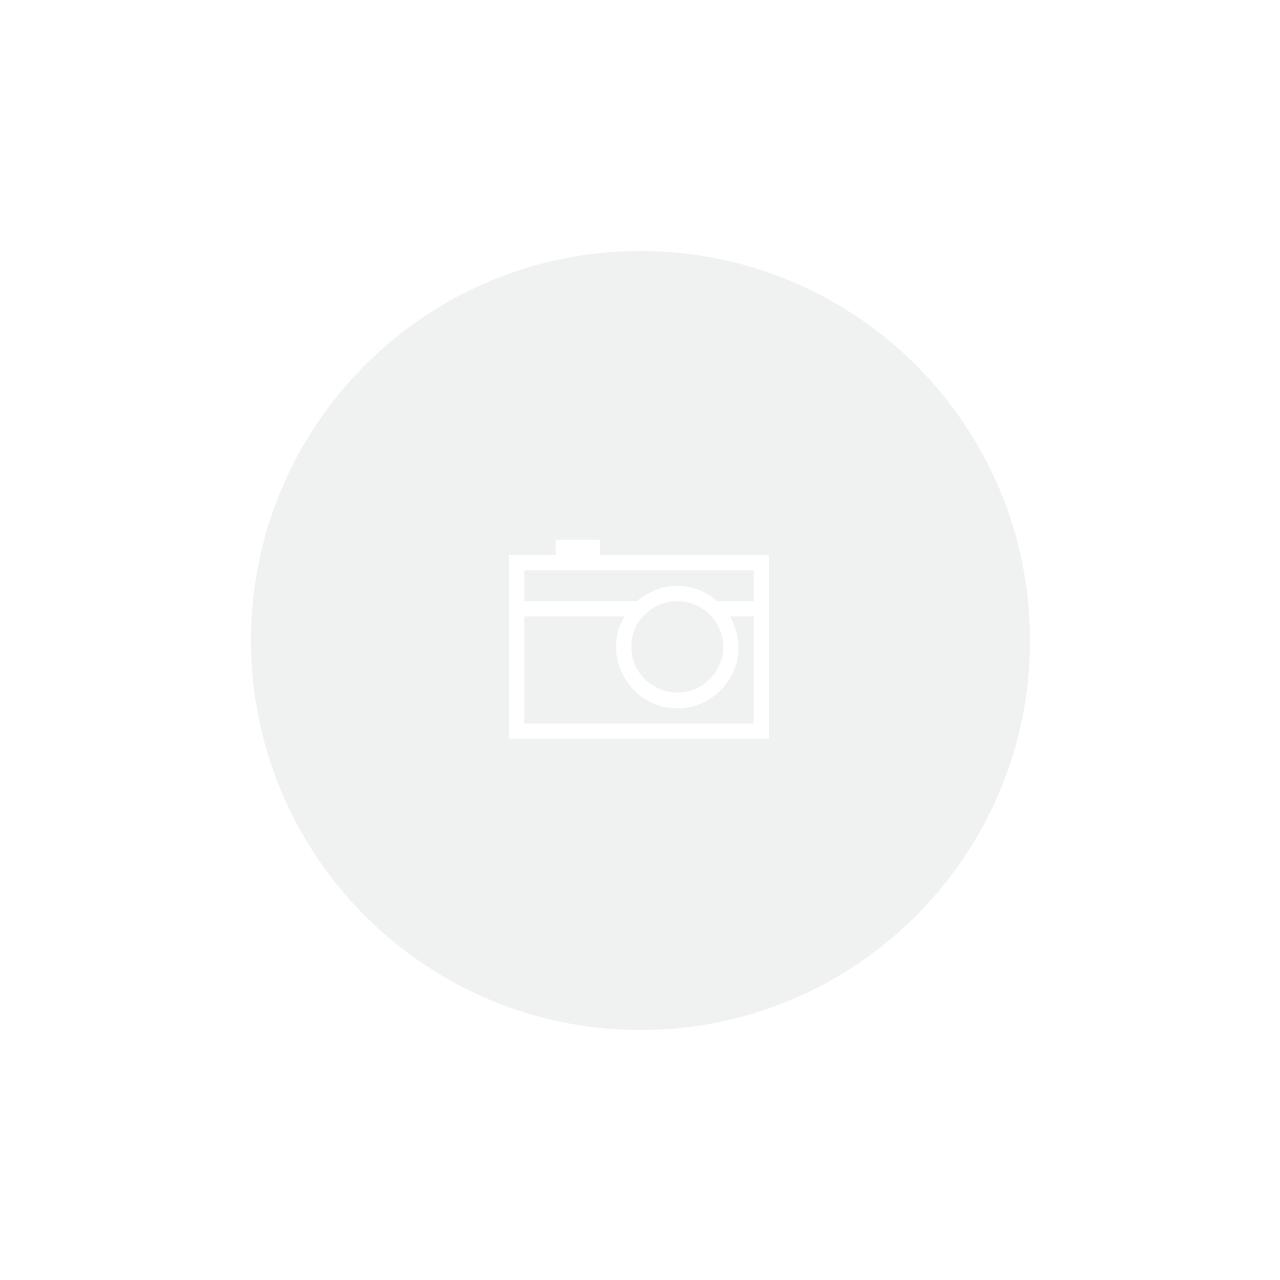 Caçarola Rasa Inox 16Cm 1,40 Litros Duo Silicone Tramontina